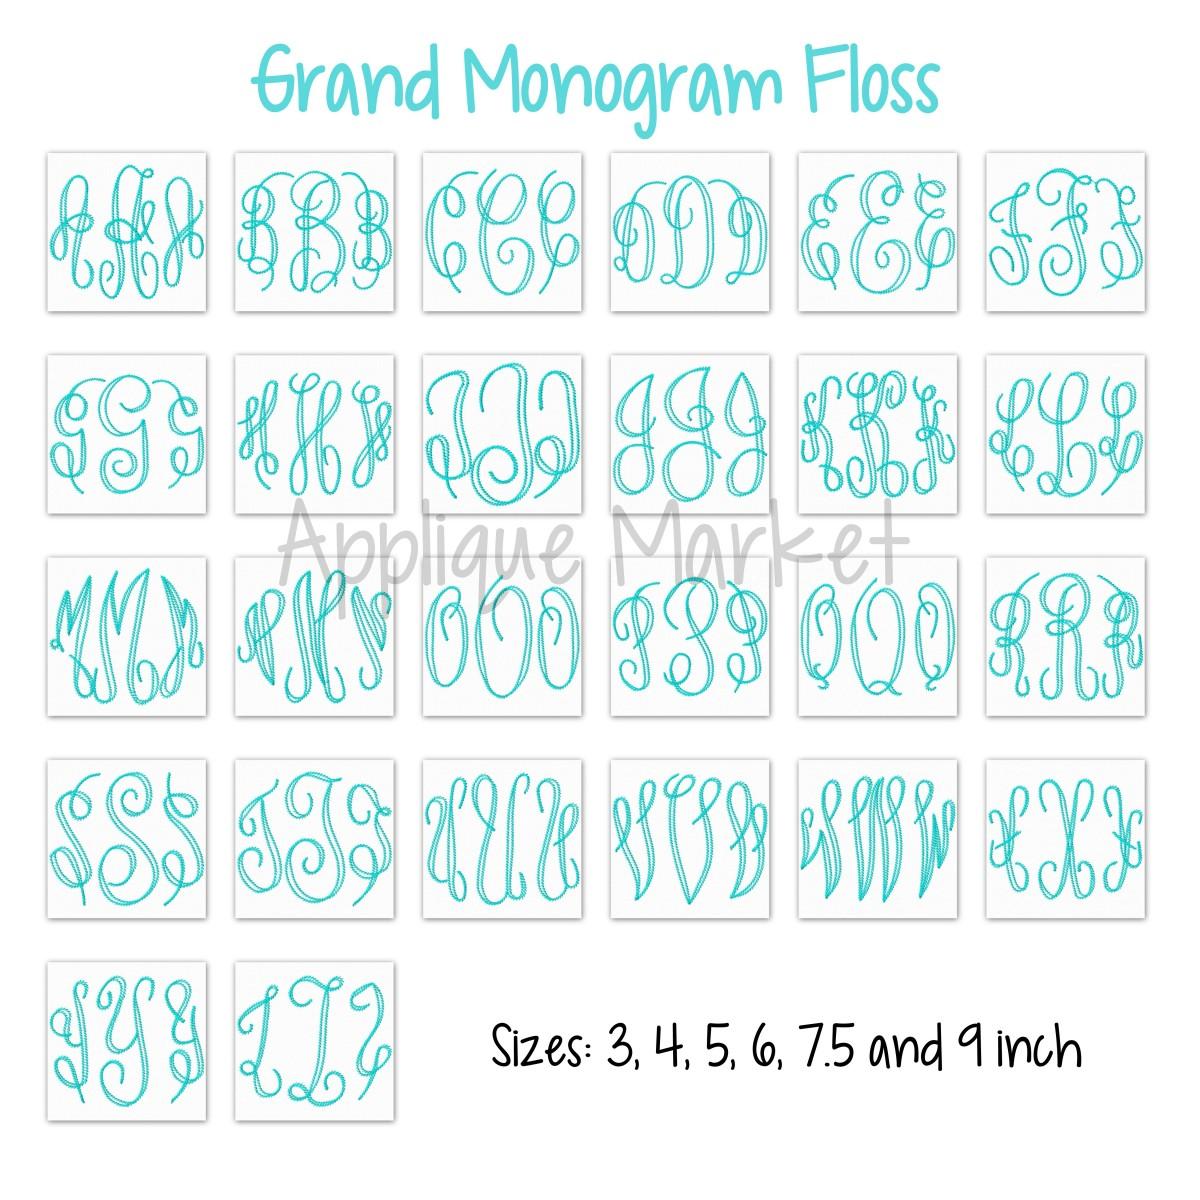 grand monogram floss stitch